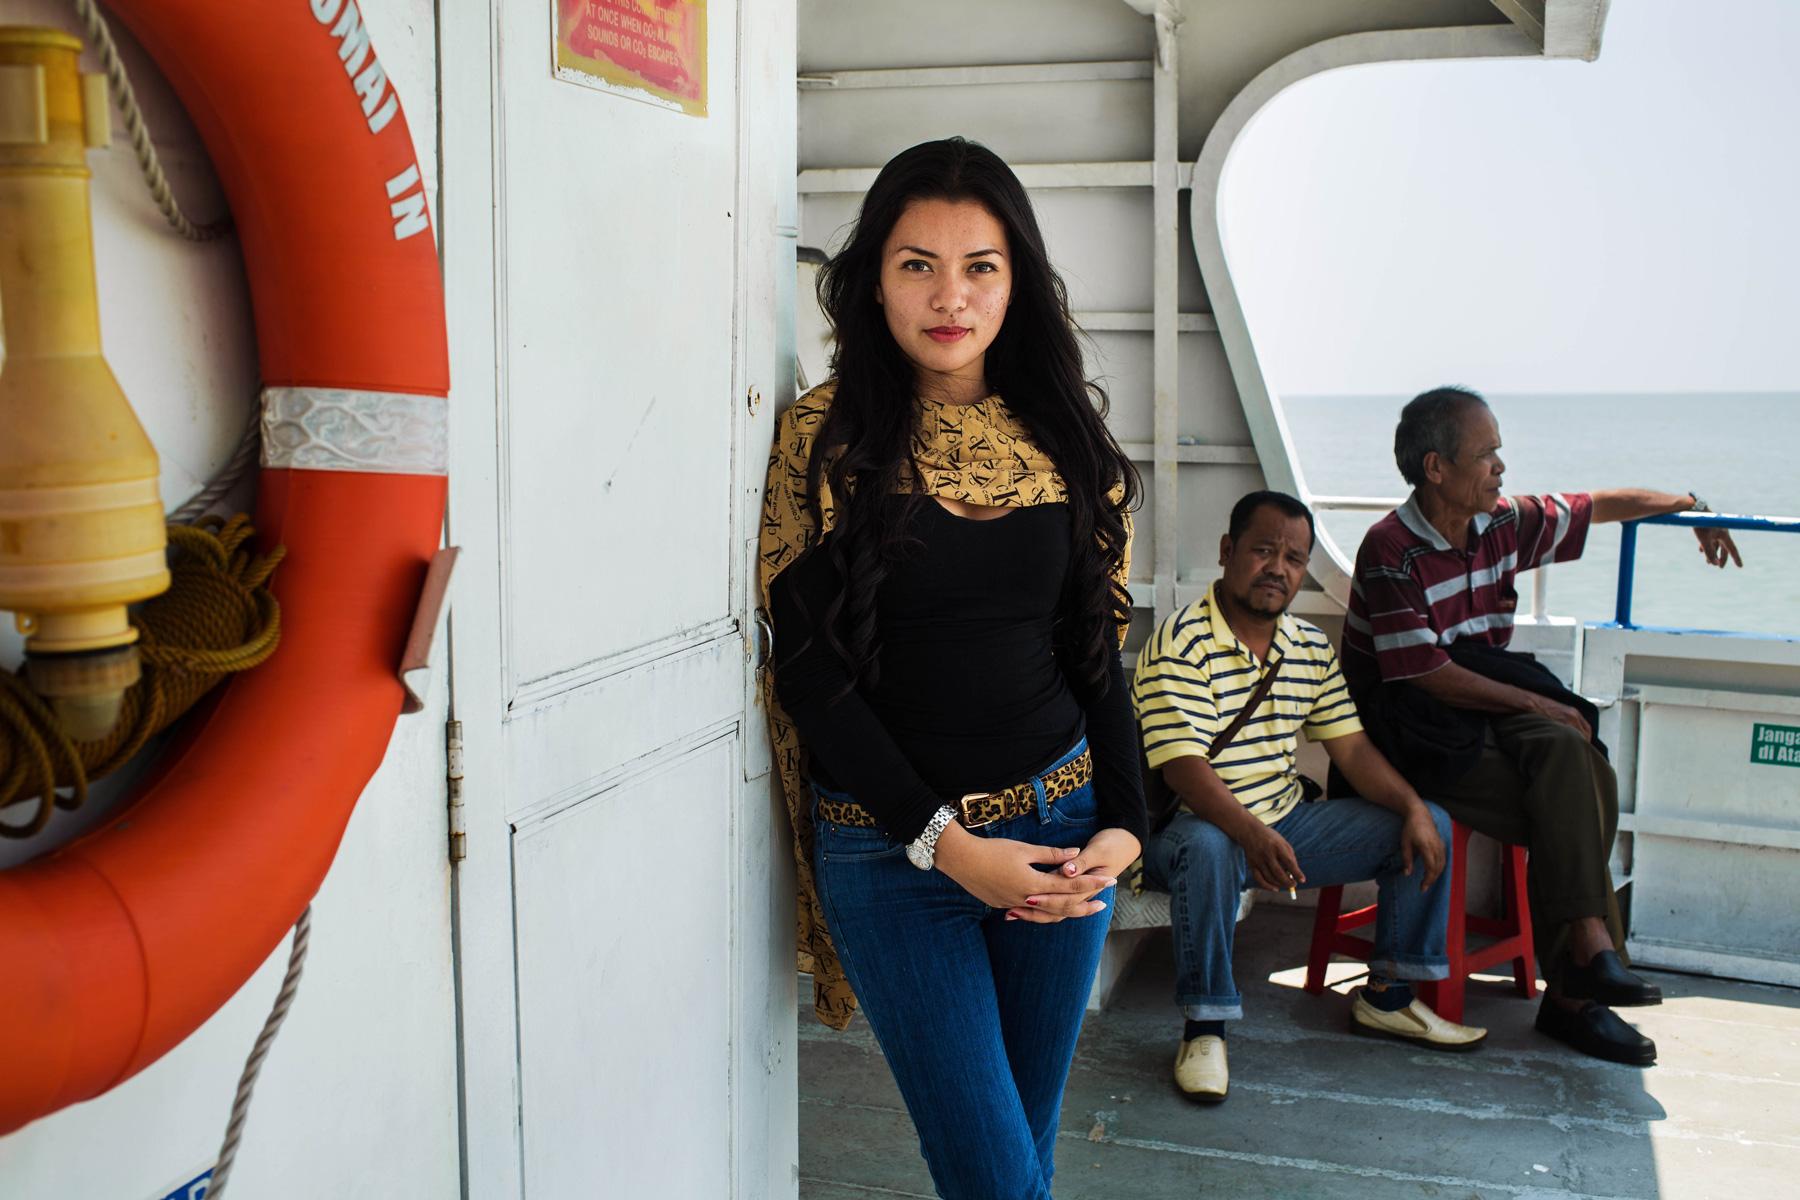 Mihaela-Noroc-Atlas-of-Beauty-Java-Sea-Indonesia